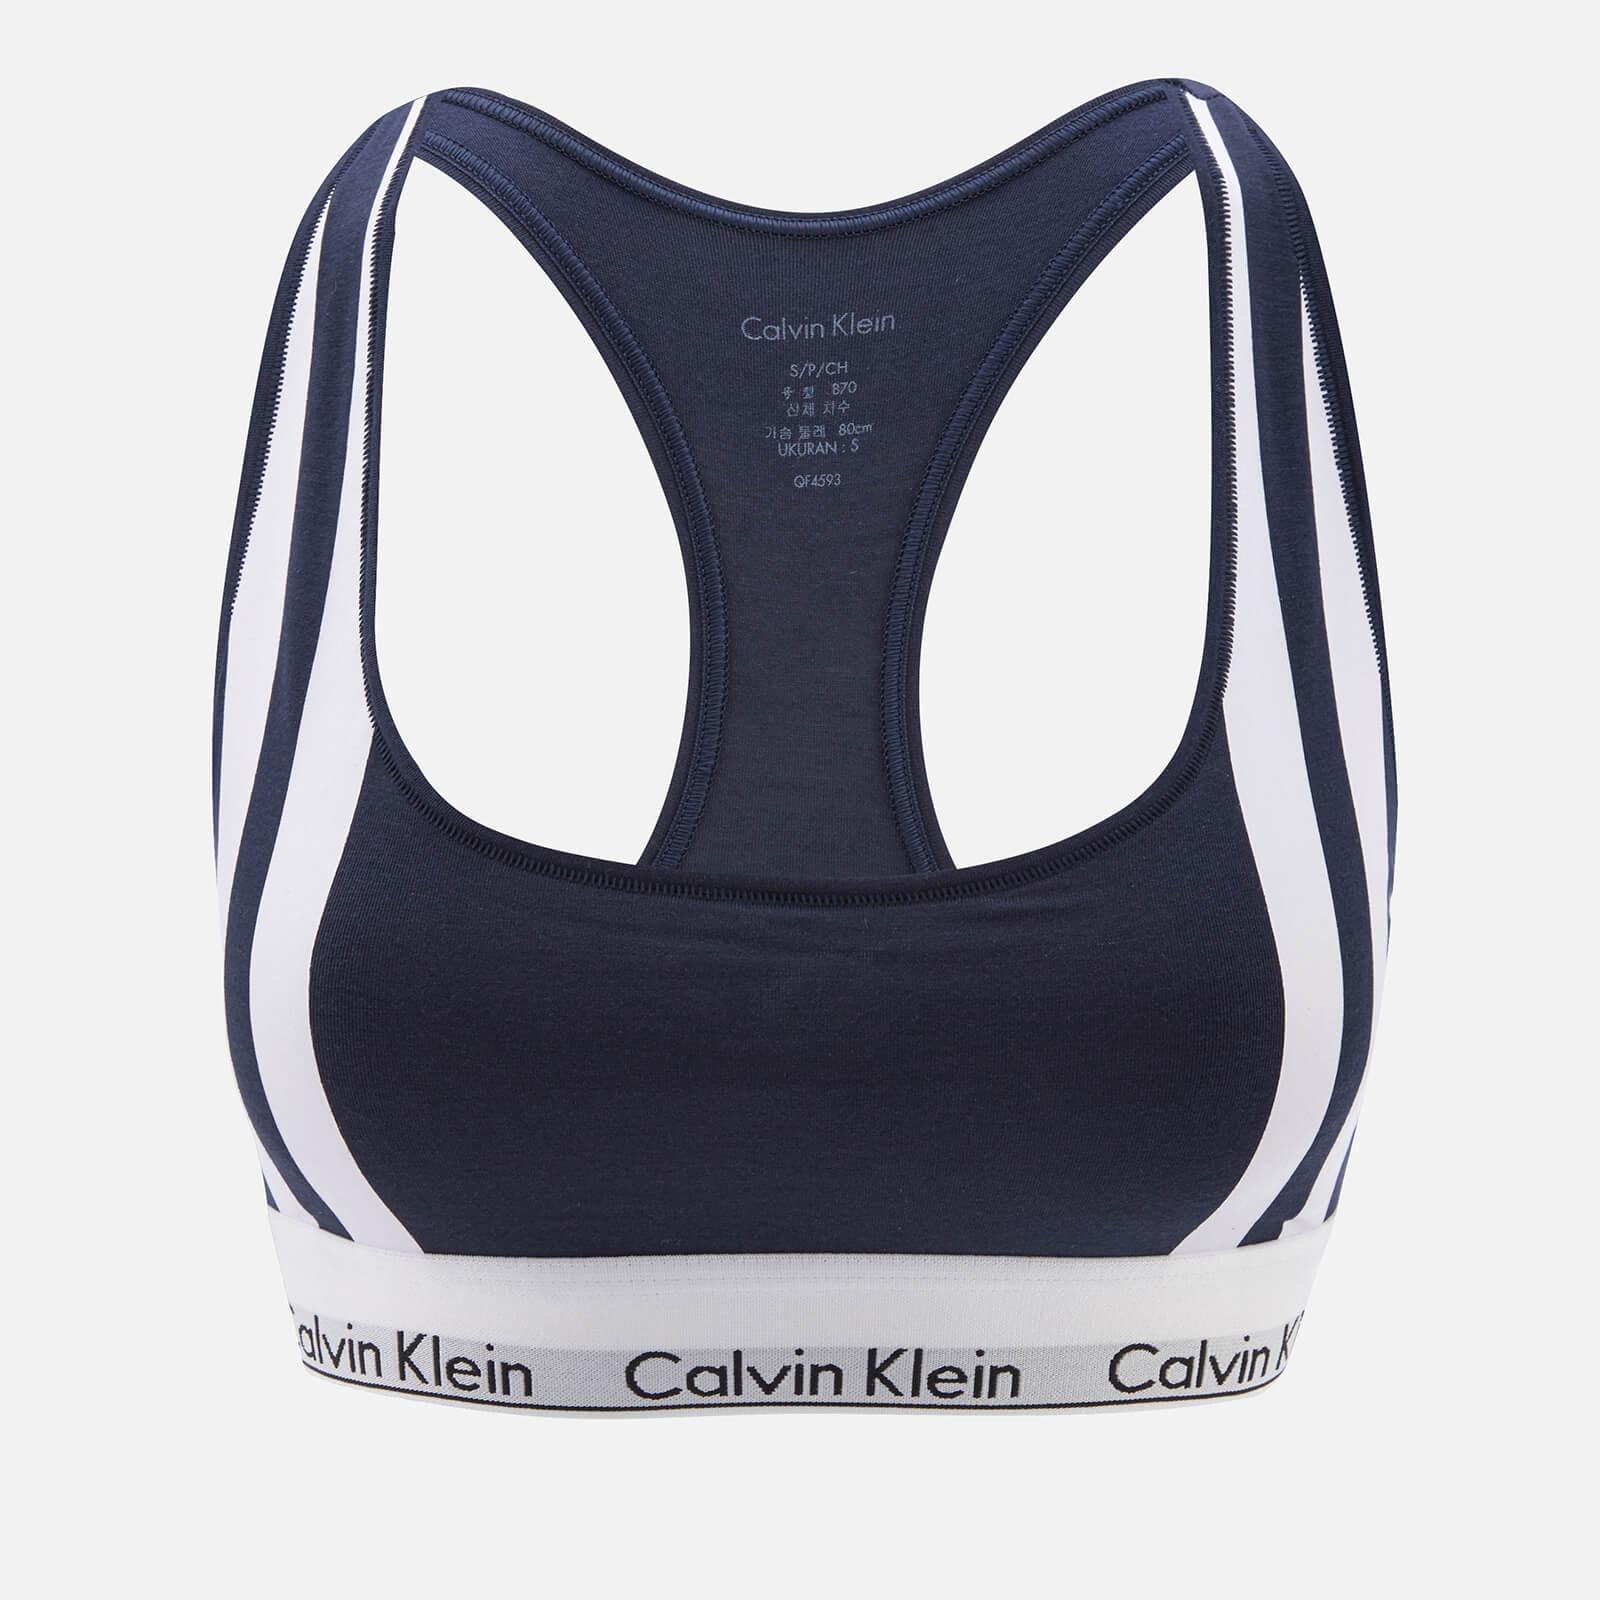 4d6c0dc850b62 Calvin Klein Women s Varsity Stripe Unlined Bralette - Navy - Free UK  Delivery over £50